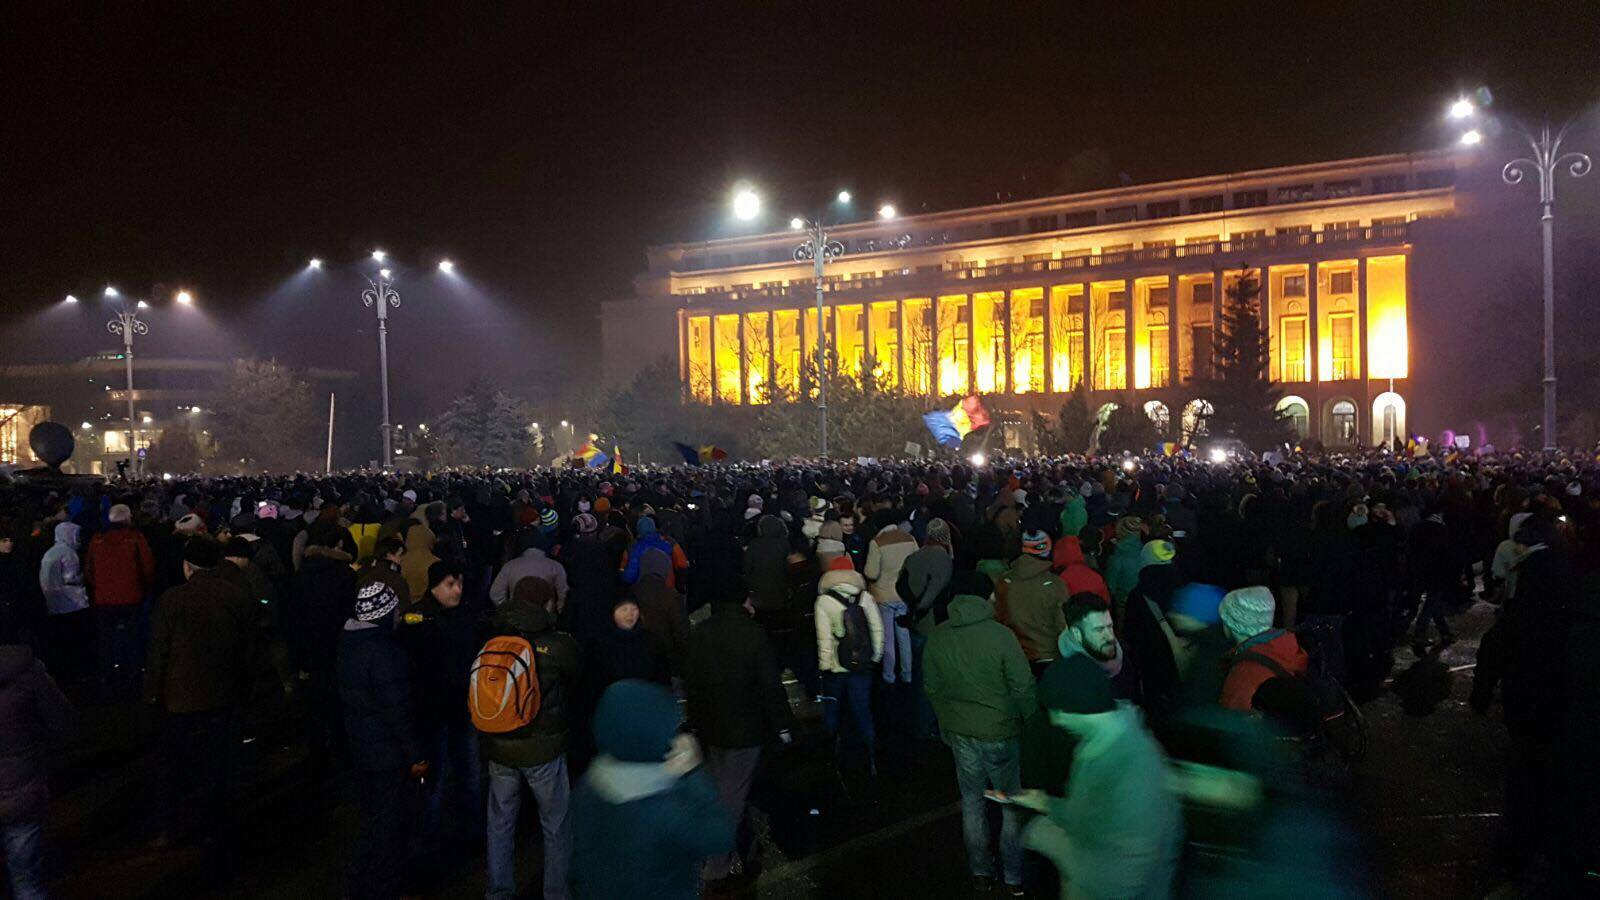 Peste 15.000 de persoane au protestat in Piata Victoriei. Oamenii anunta manifestatii in fiecare zi. VIDEO